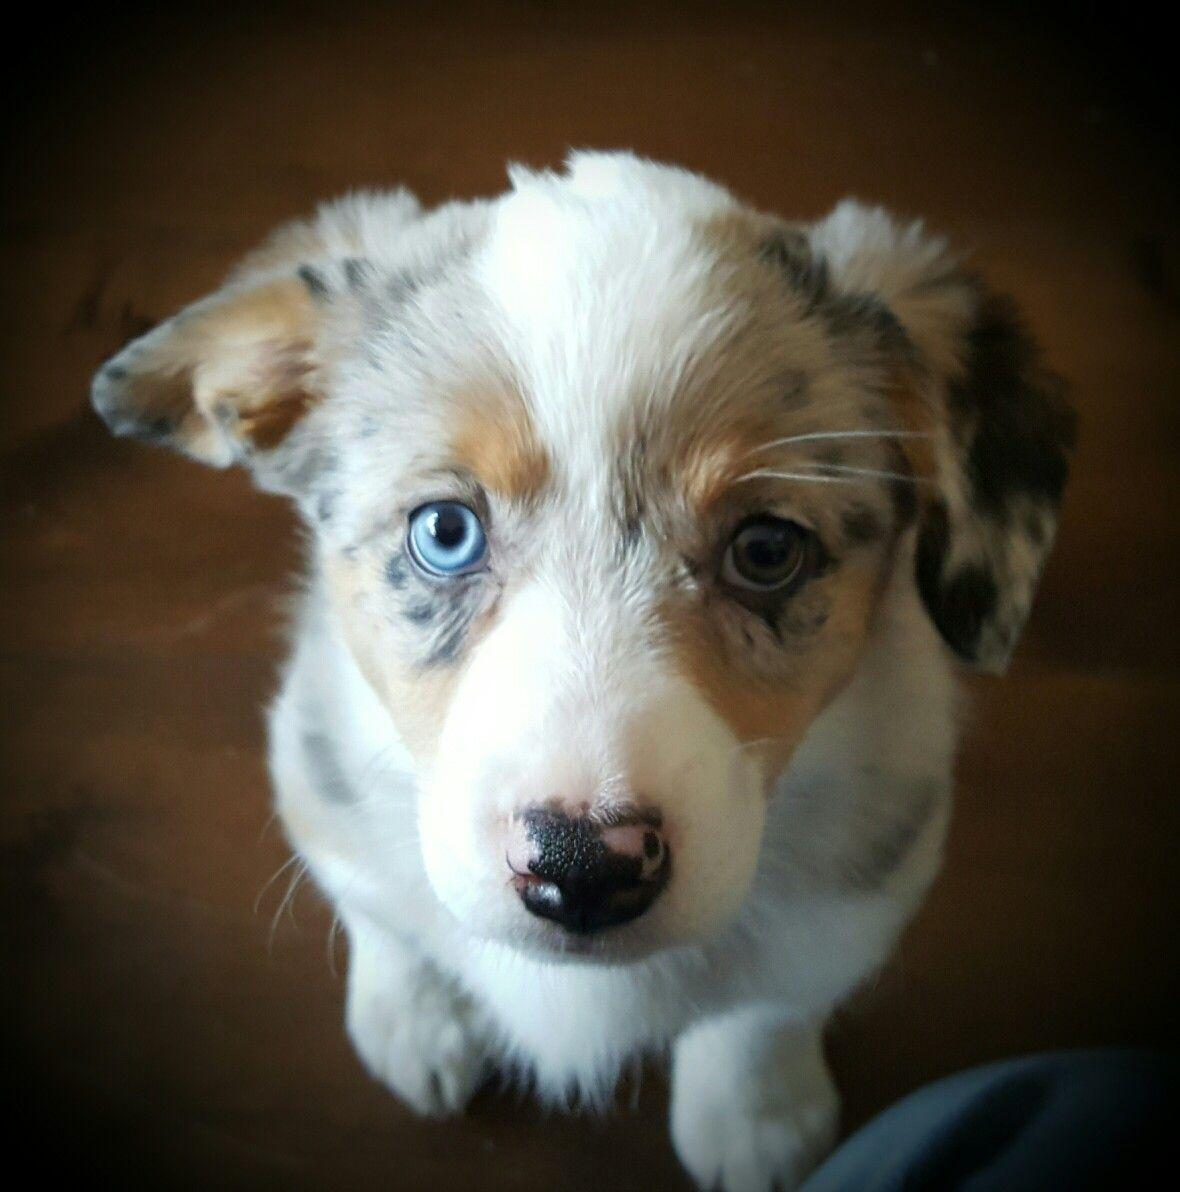 Augi Pup Aussie Corgi 2 Eye Colors Cutest Puppy Ever Corgi